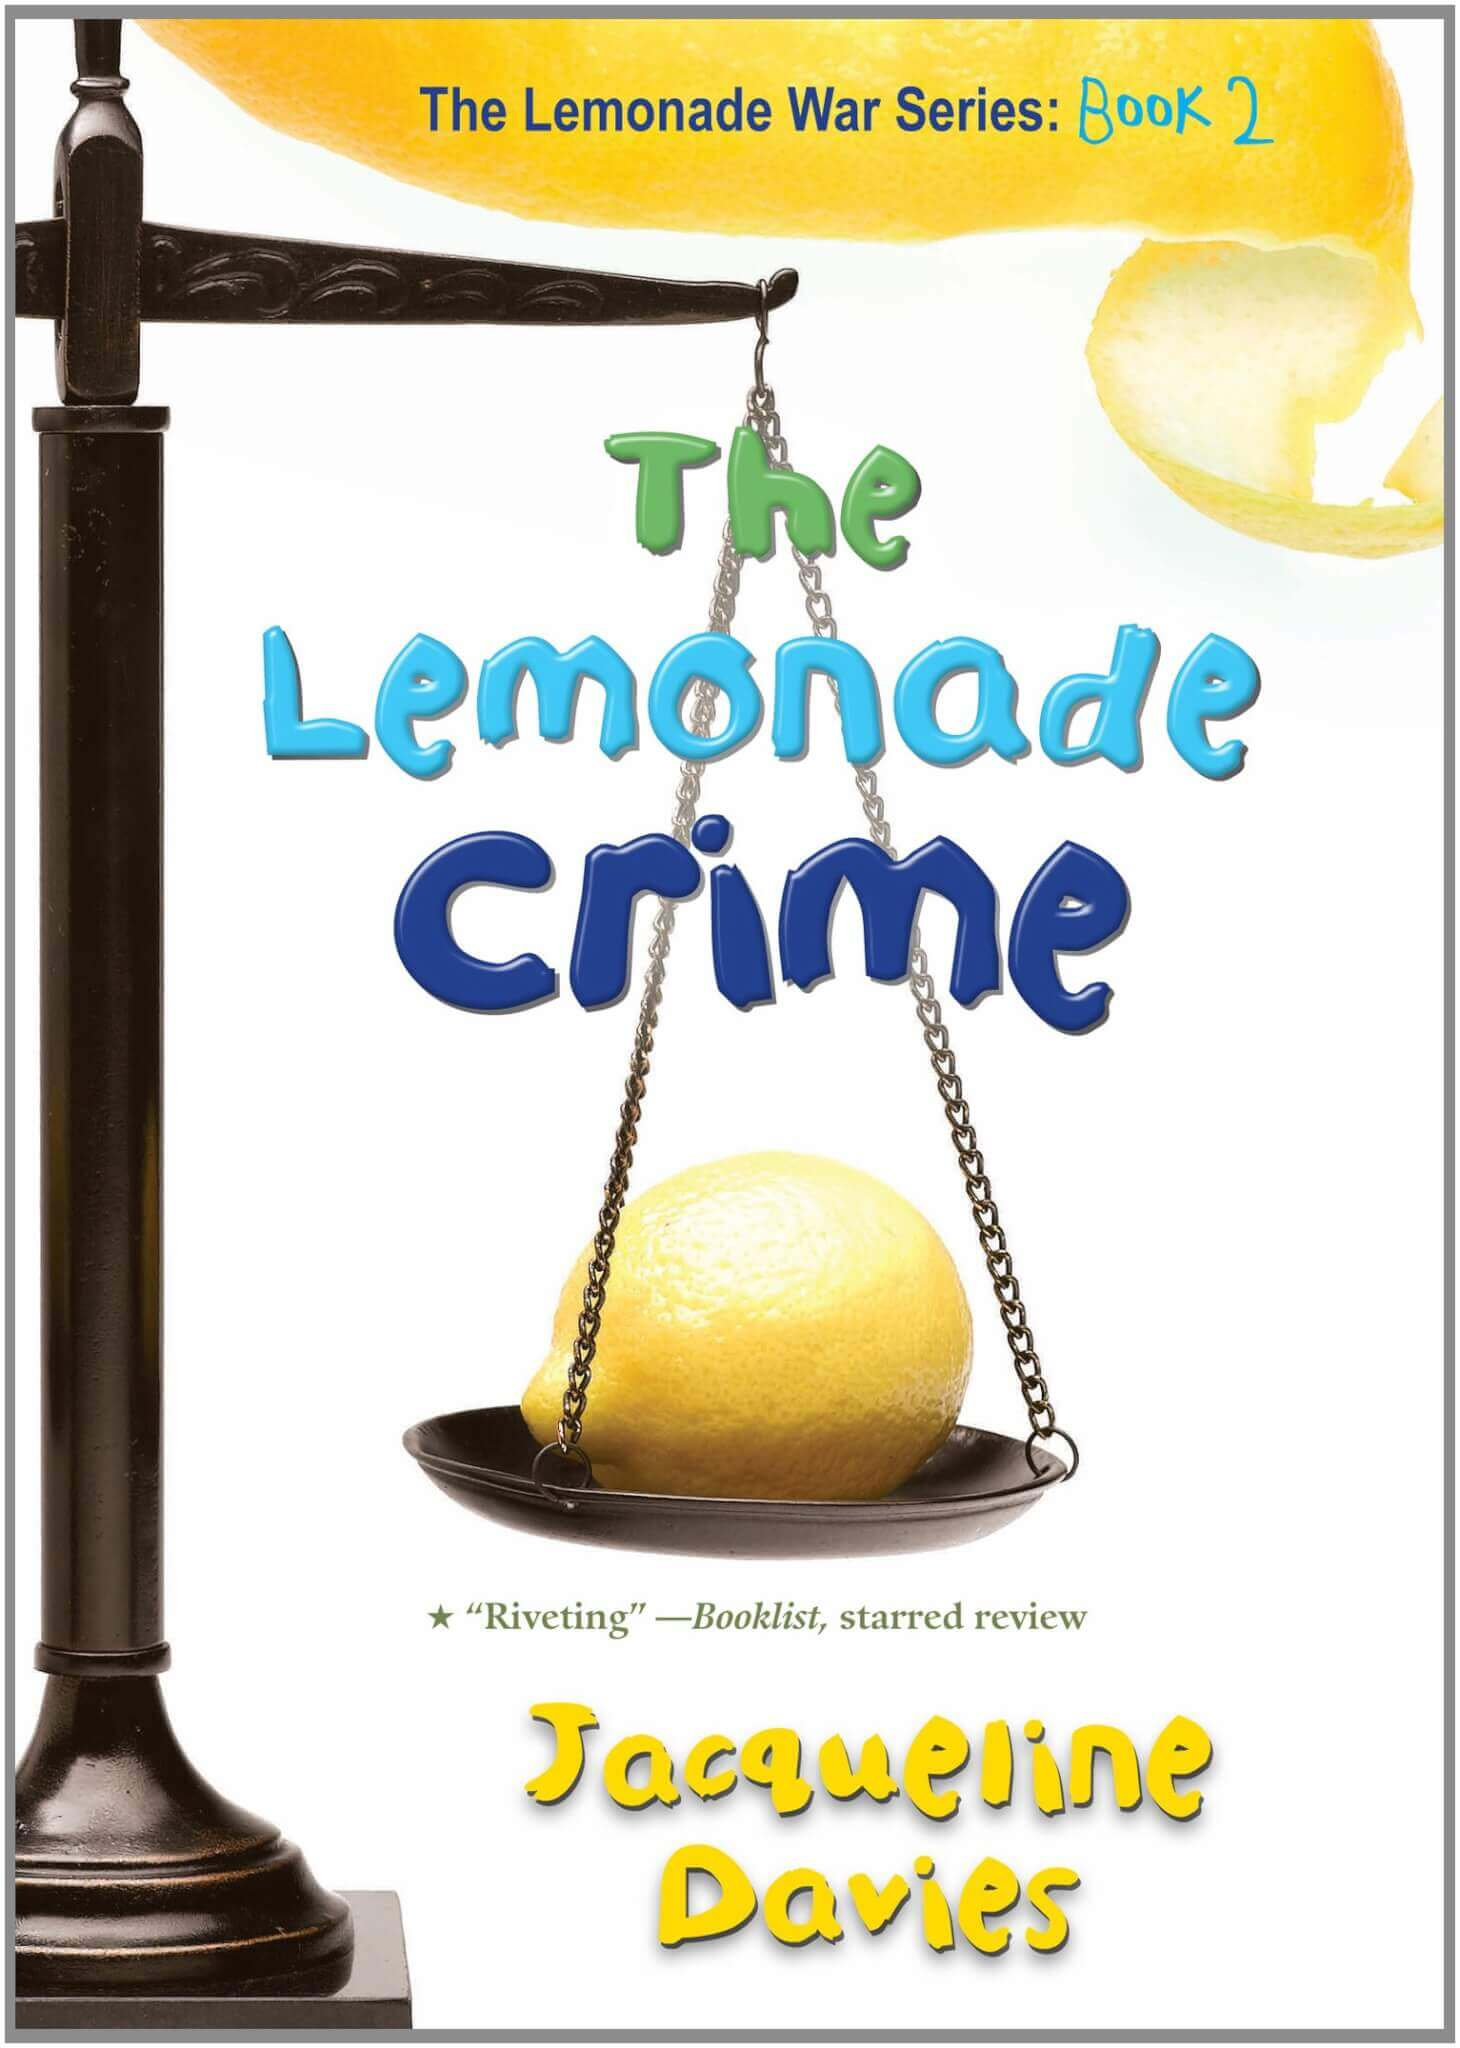 One School, One Book - The Lemonade Crime